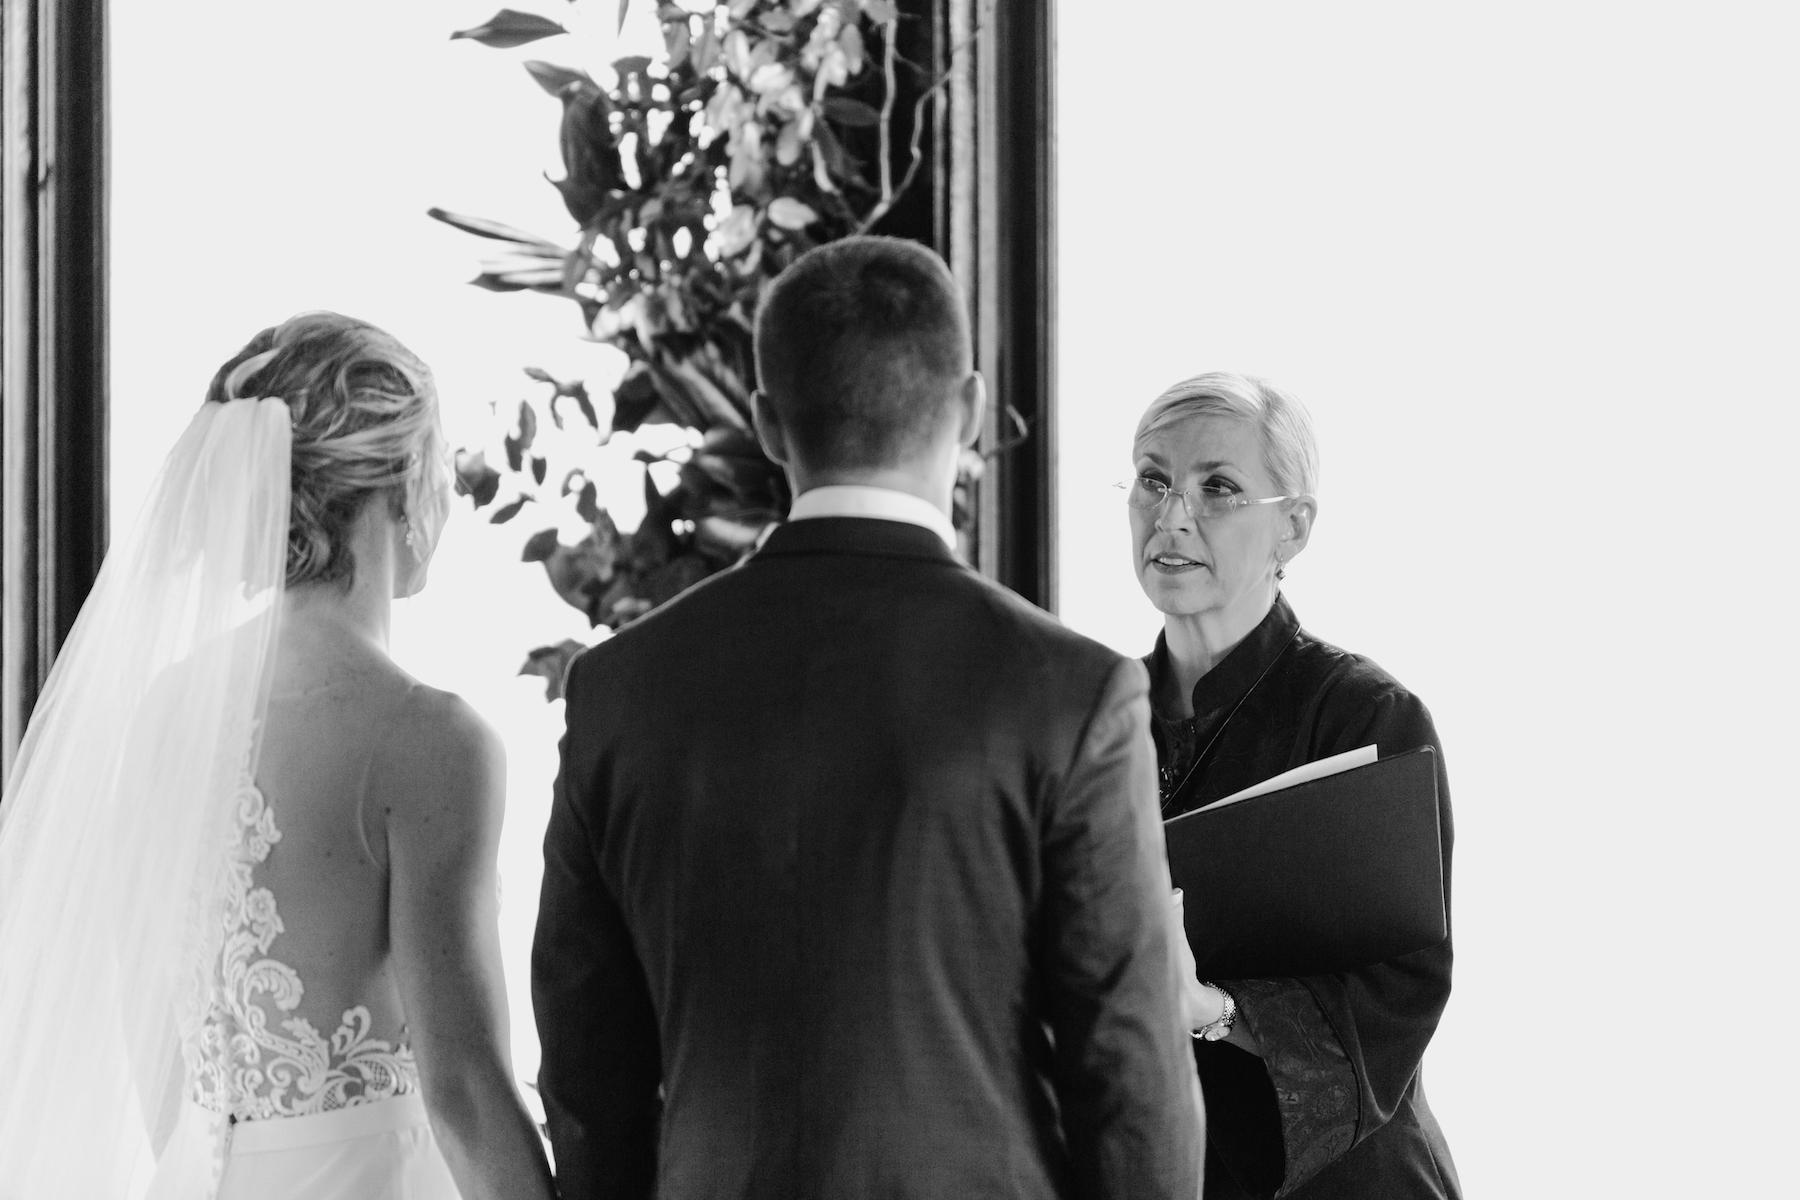 wedding-engagement-photographer-spartanburg-greenville-columbia-carolina-south-north-492.JPG